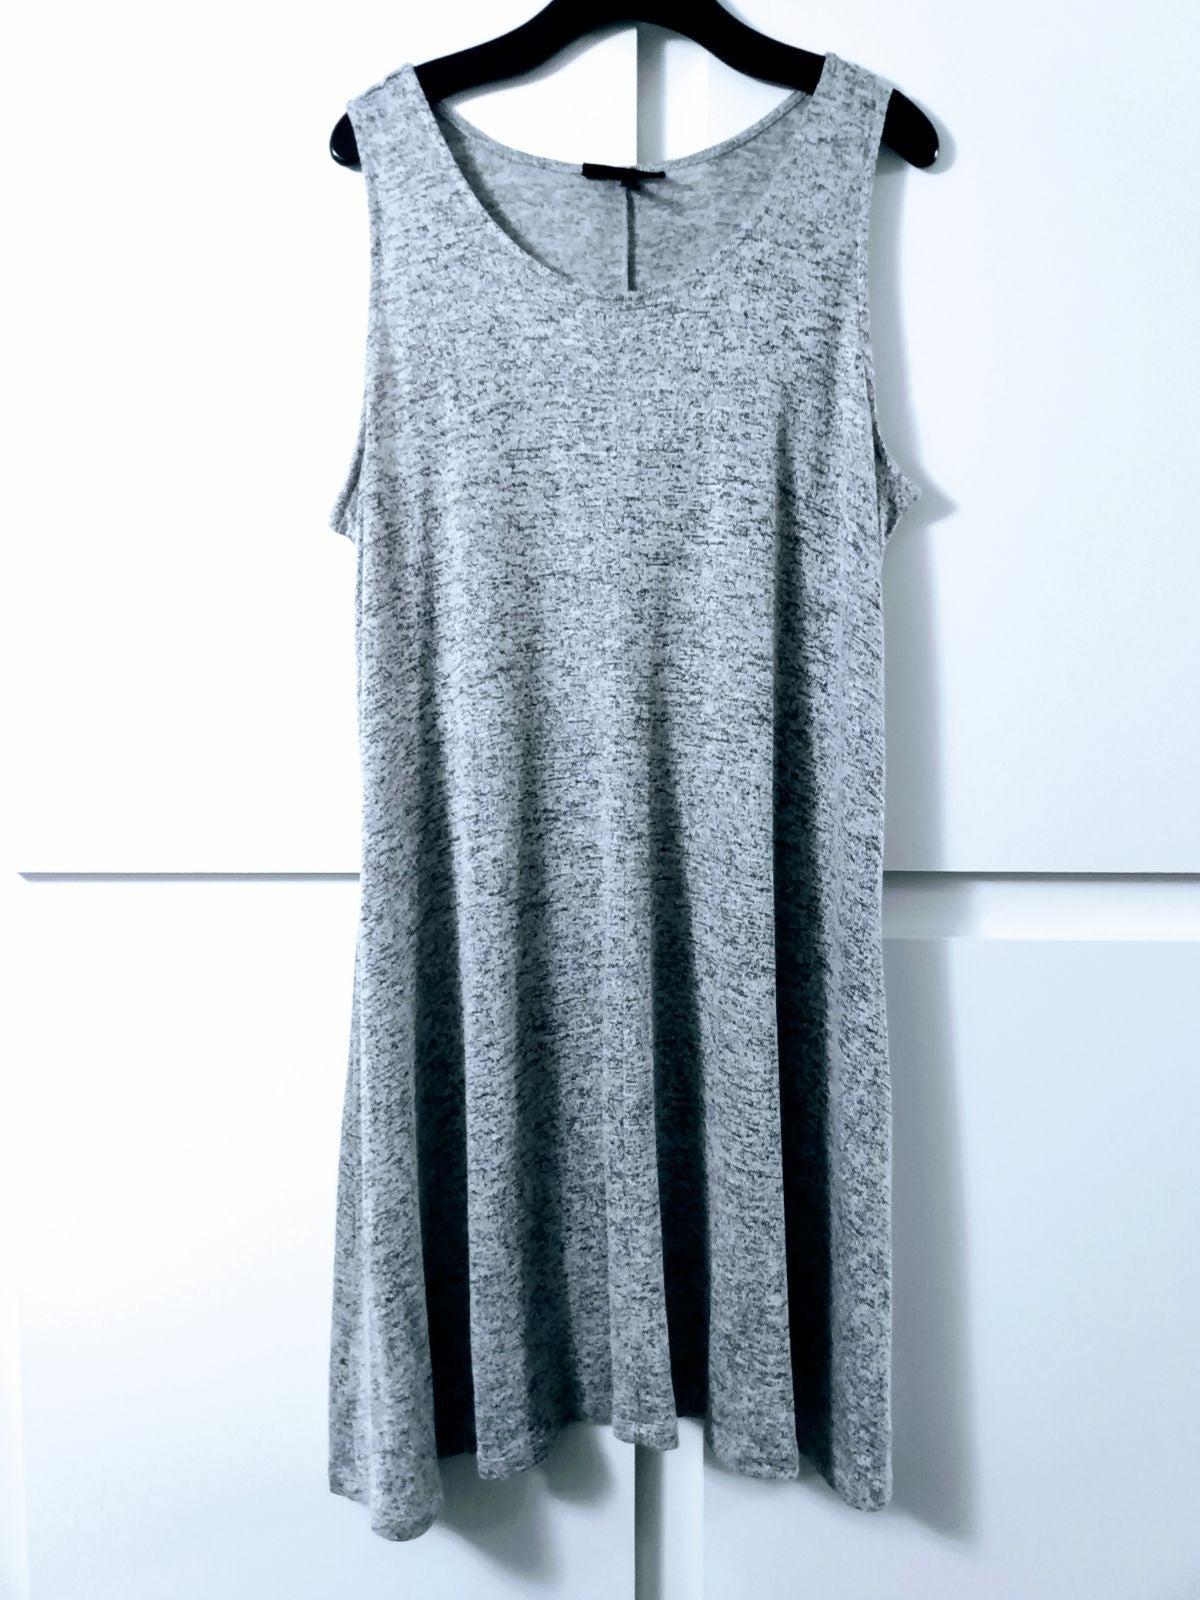 NWOT Lane Bryant Tank Dress Grey 18/20